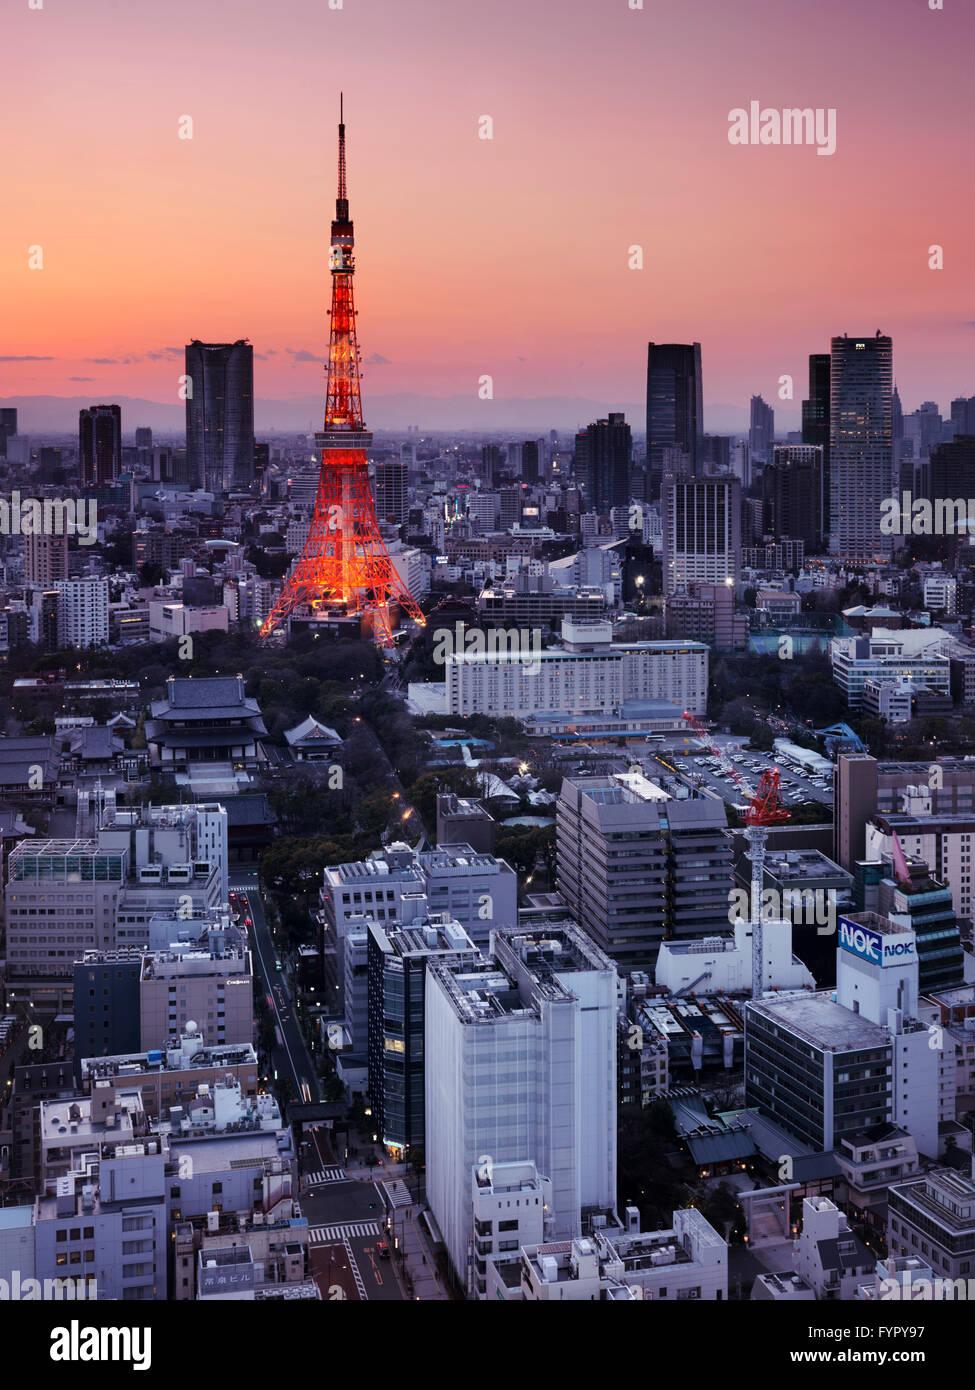 Beleuchtete Tokyo Tower bei Sonnenuntergang, Minato, Tokio, Japan Stockbild